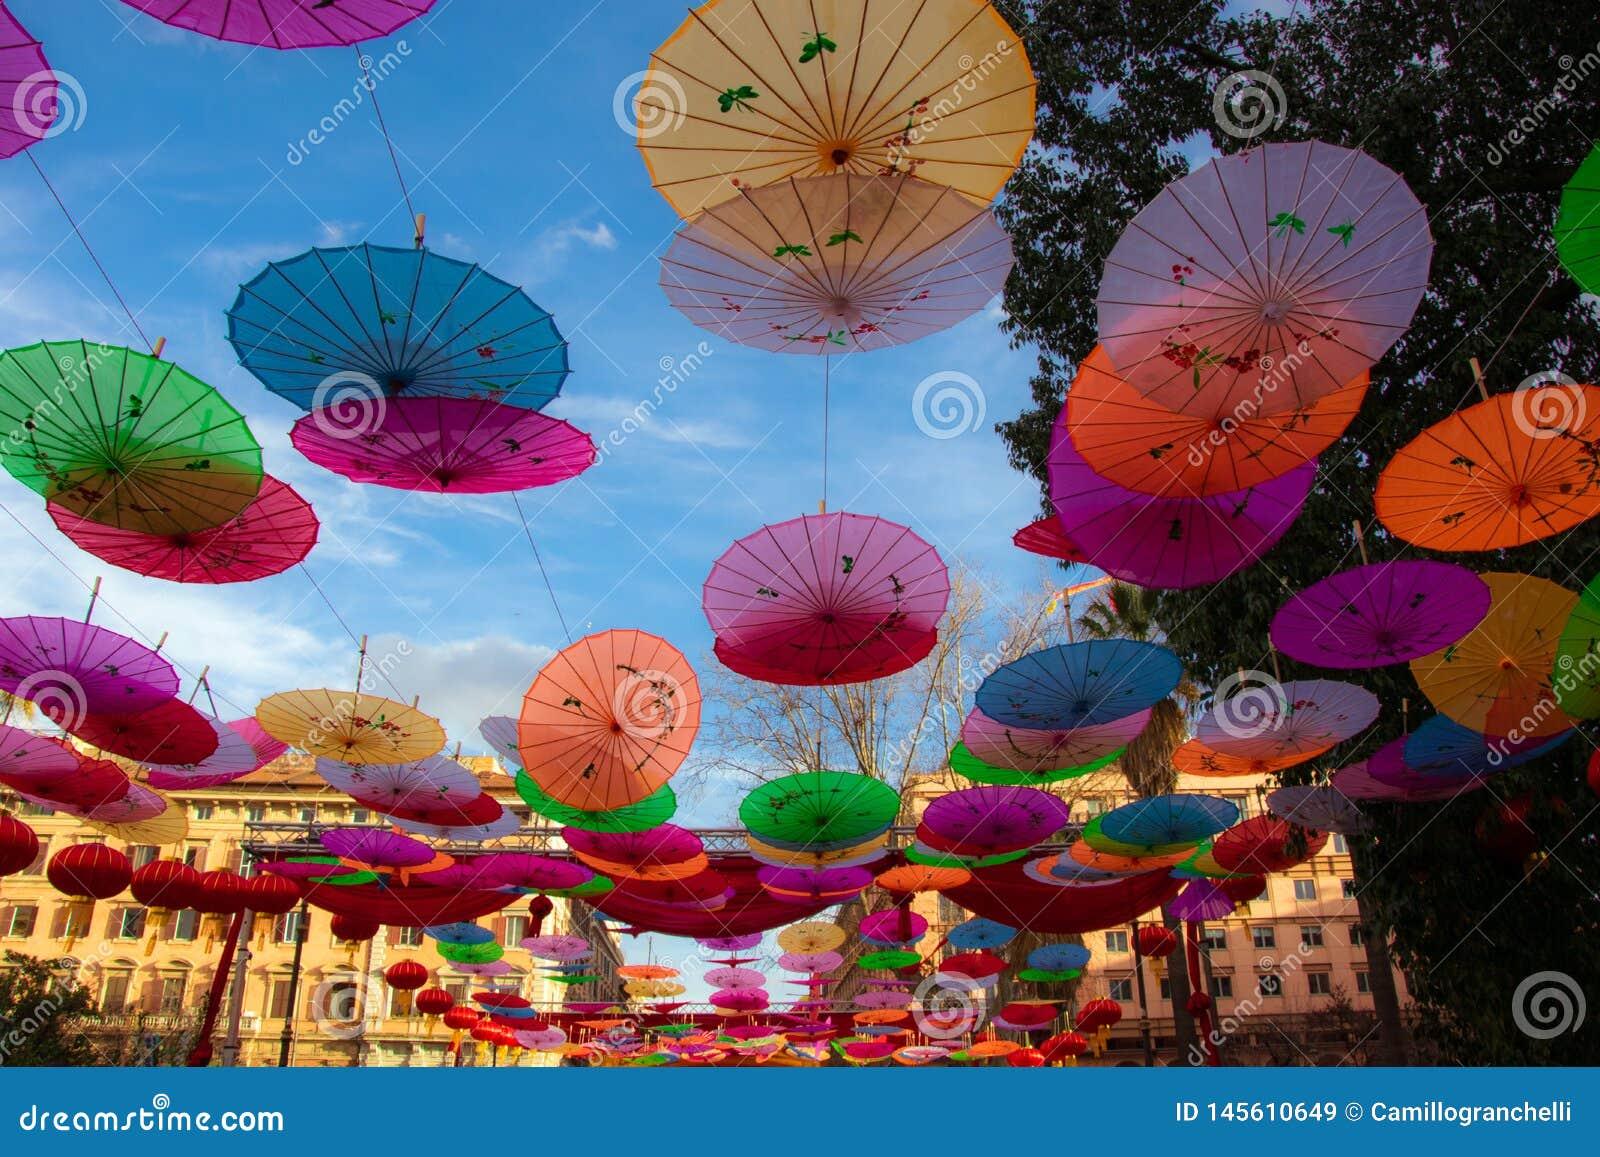 Guarda-chuvas de papel coloridos no fundo do céu